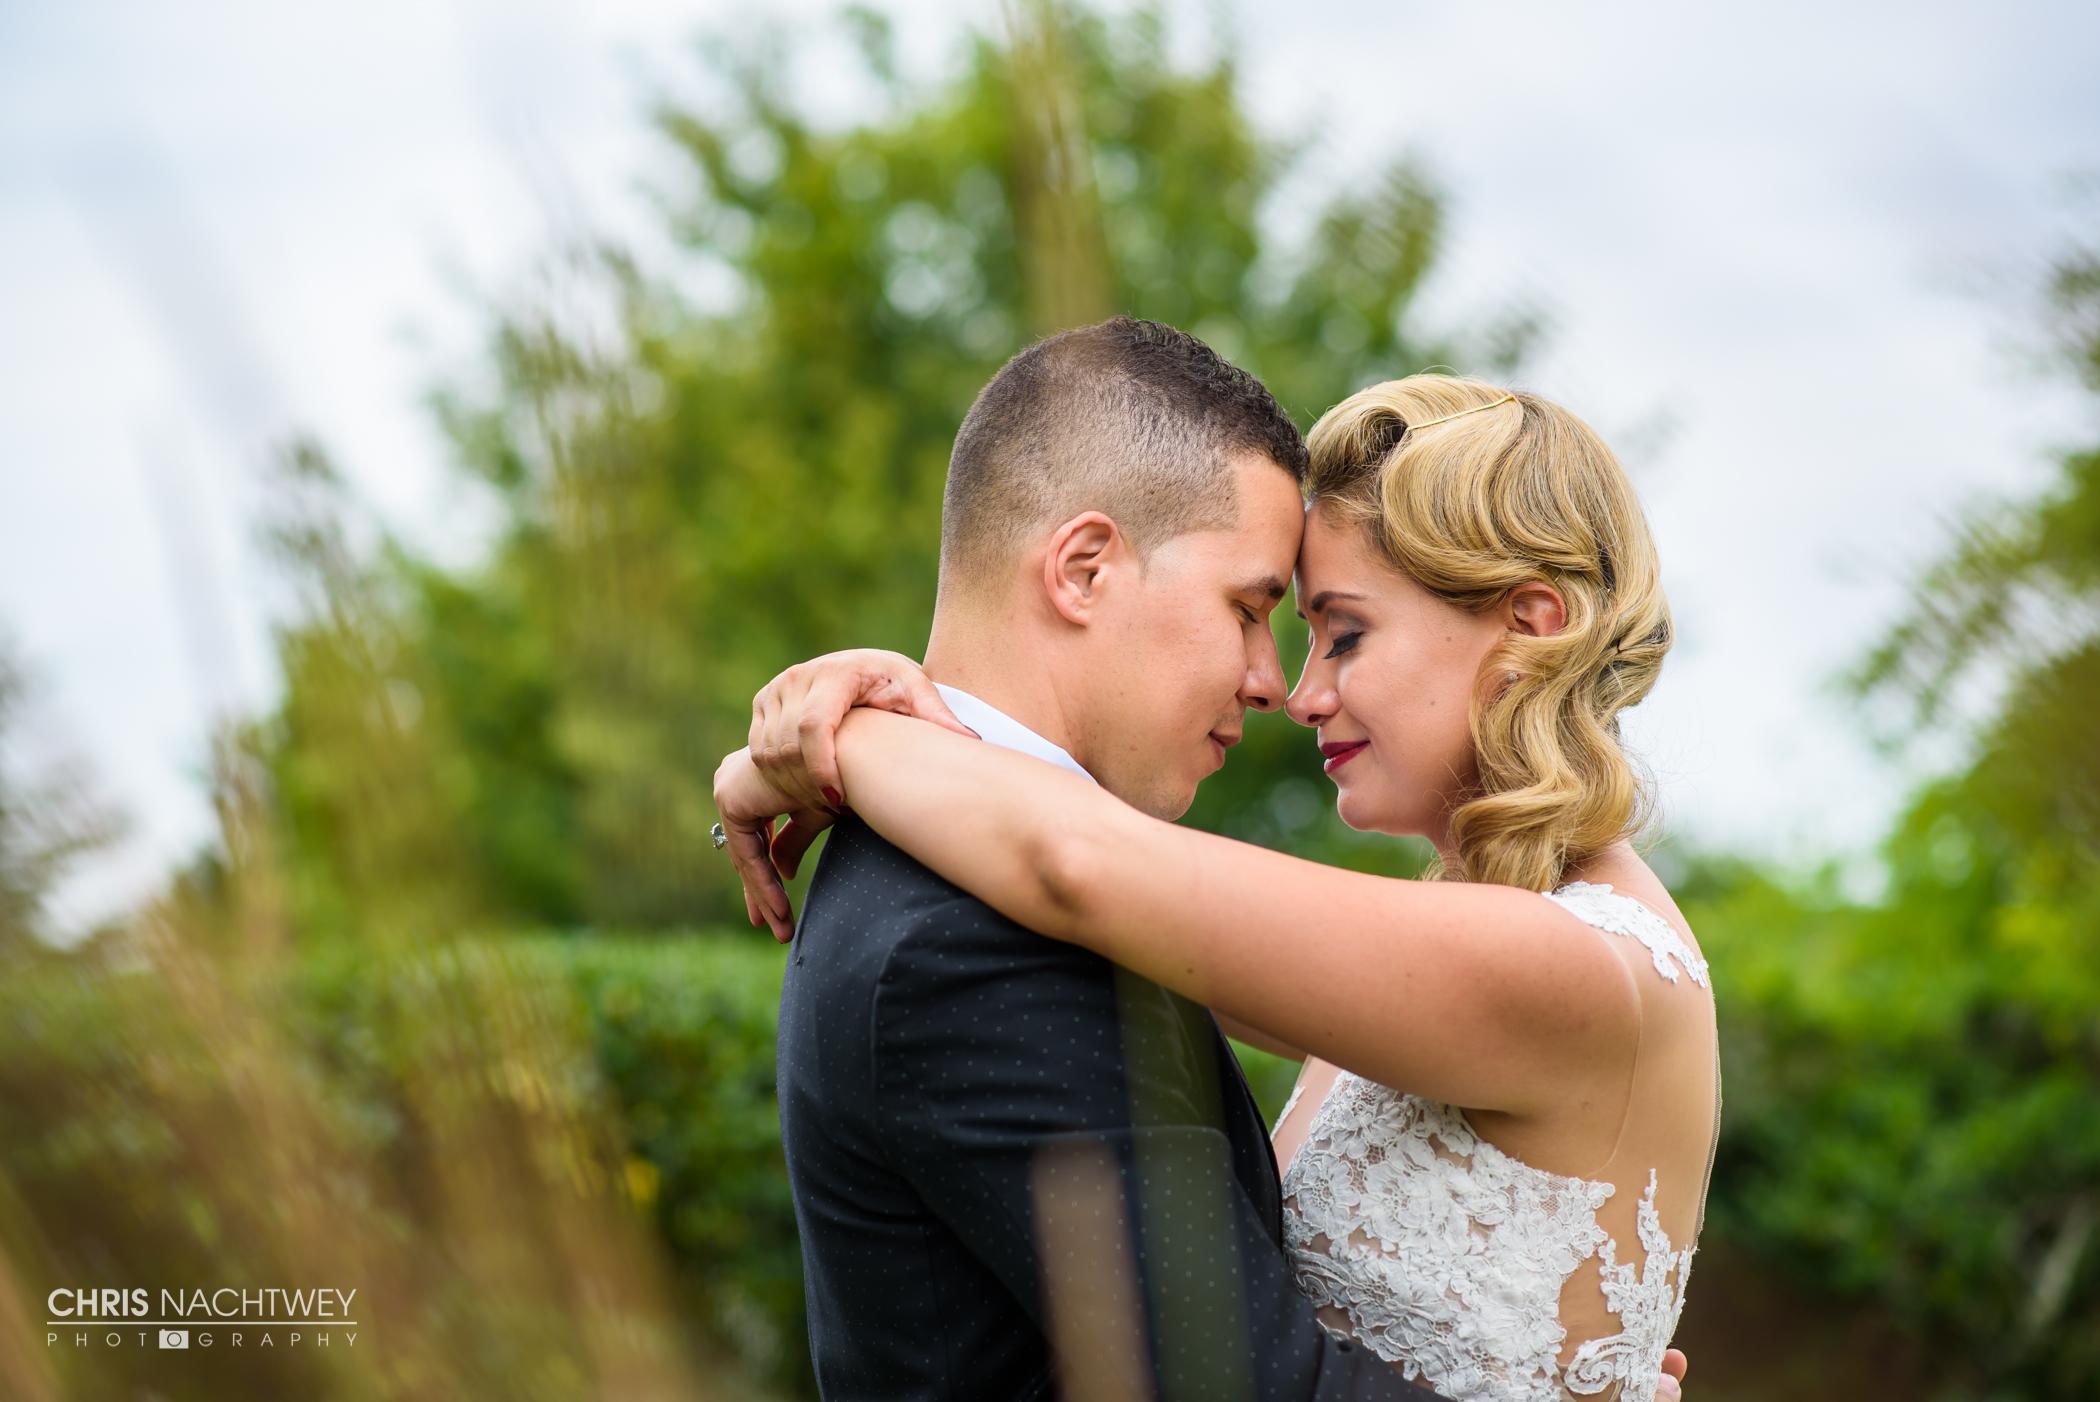 wedding-saltwater-farm-vineyard-photos-stonington-ct-chris-nachtwey-photography-2016-ana-austin-18.jpg